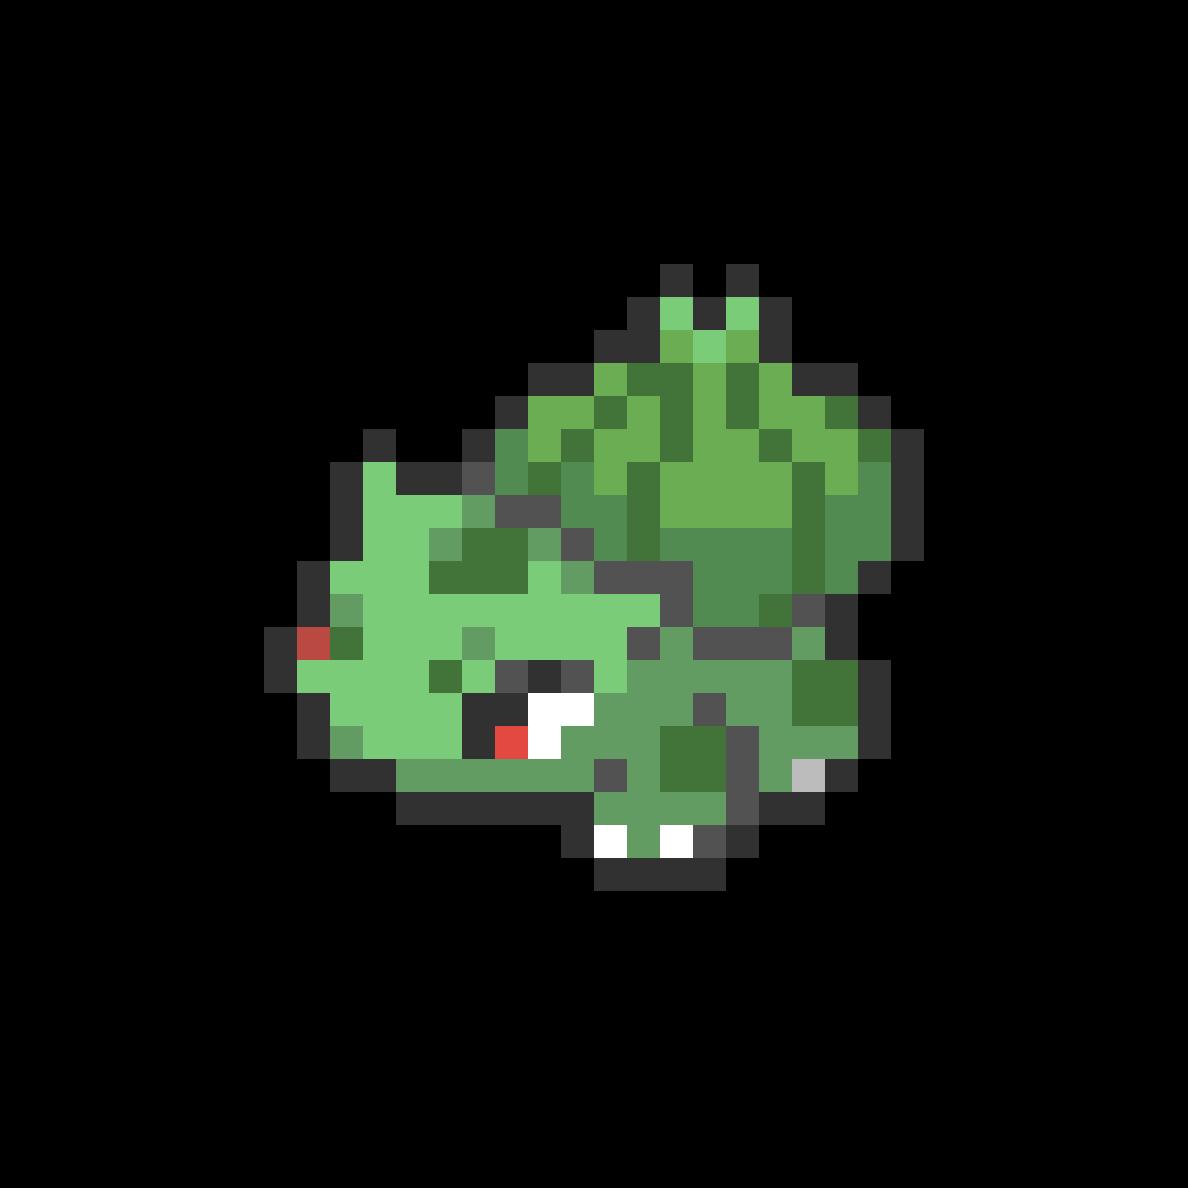 #001 Bulbasaur Mini Sprite